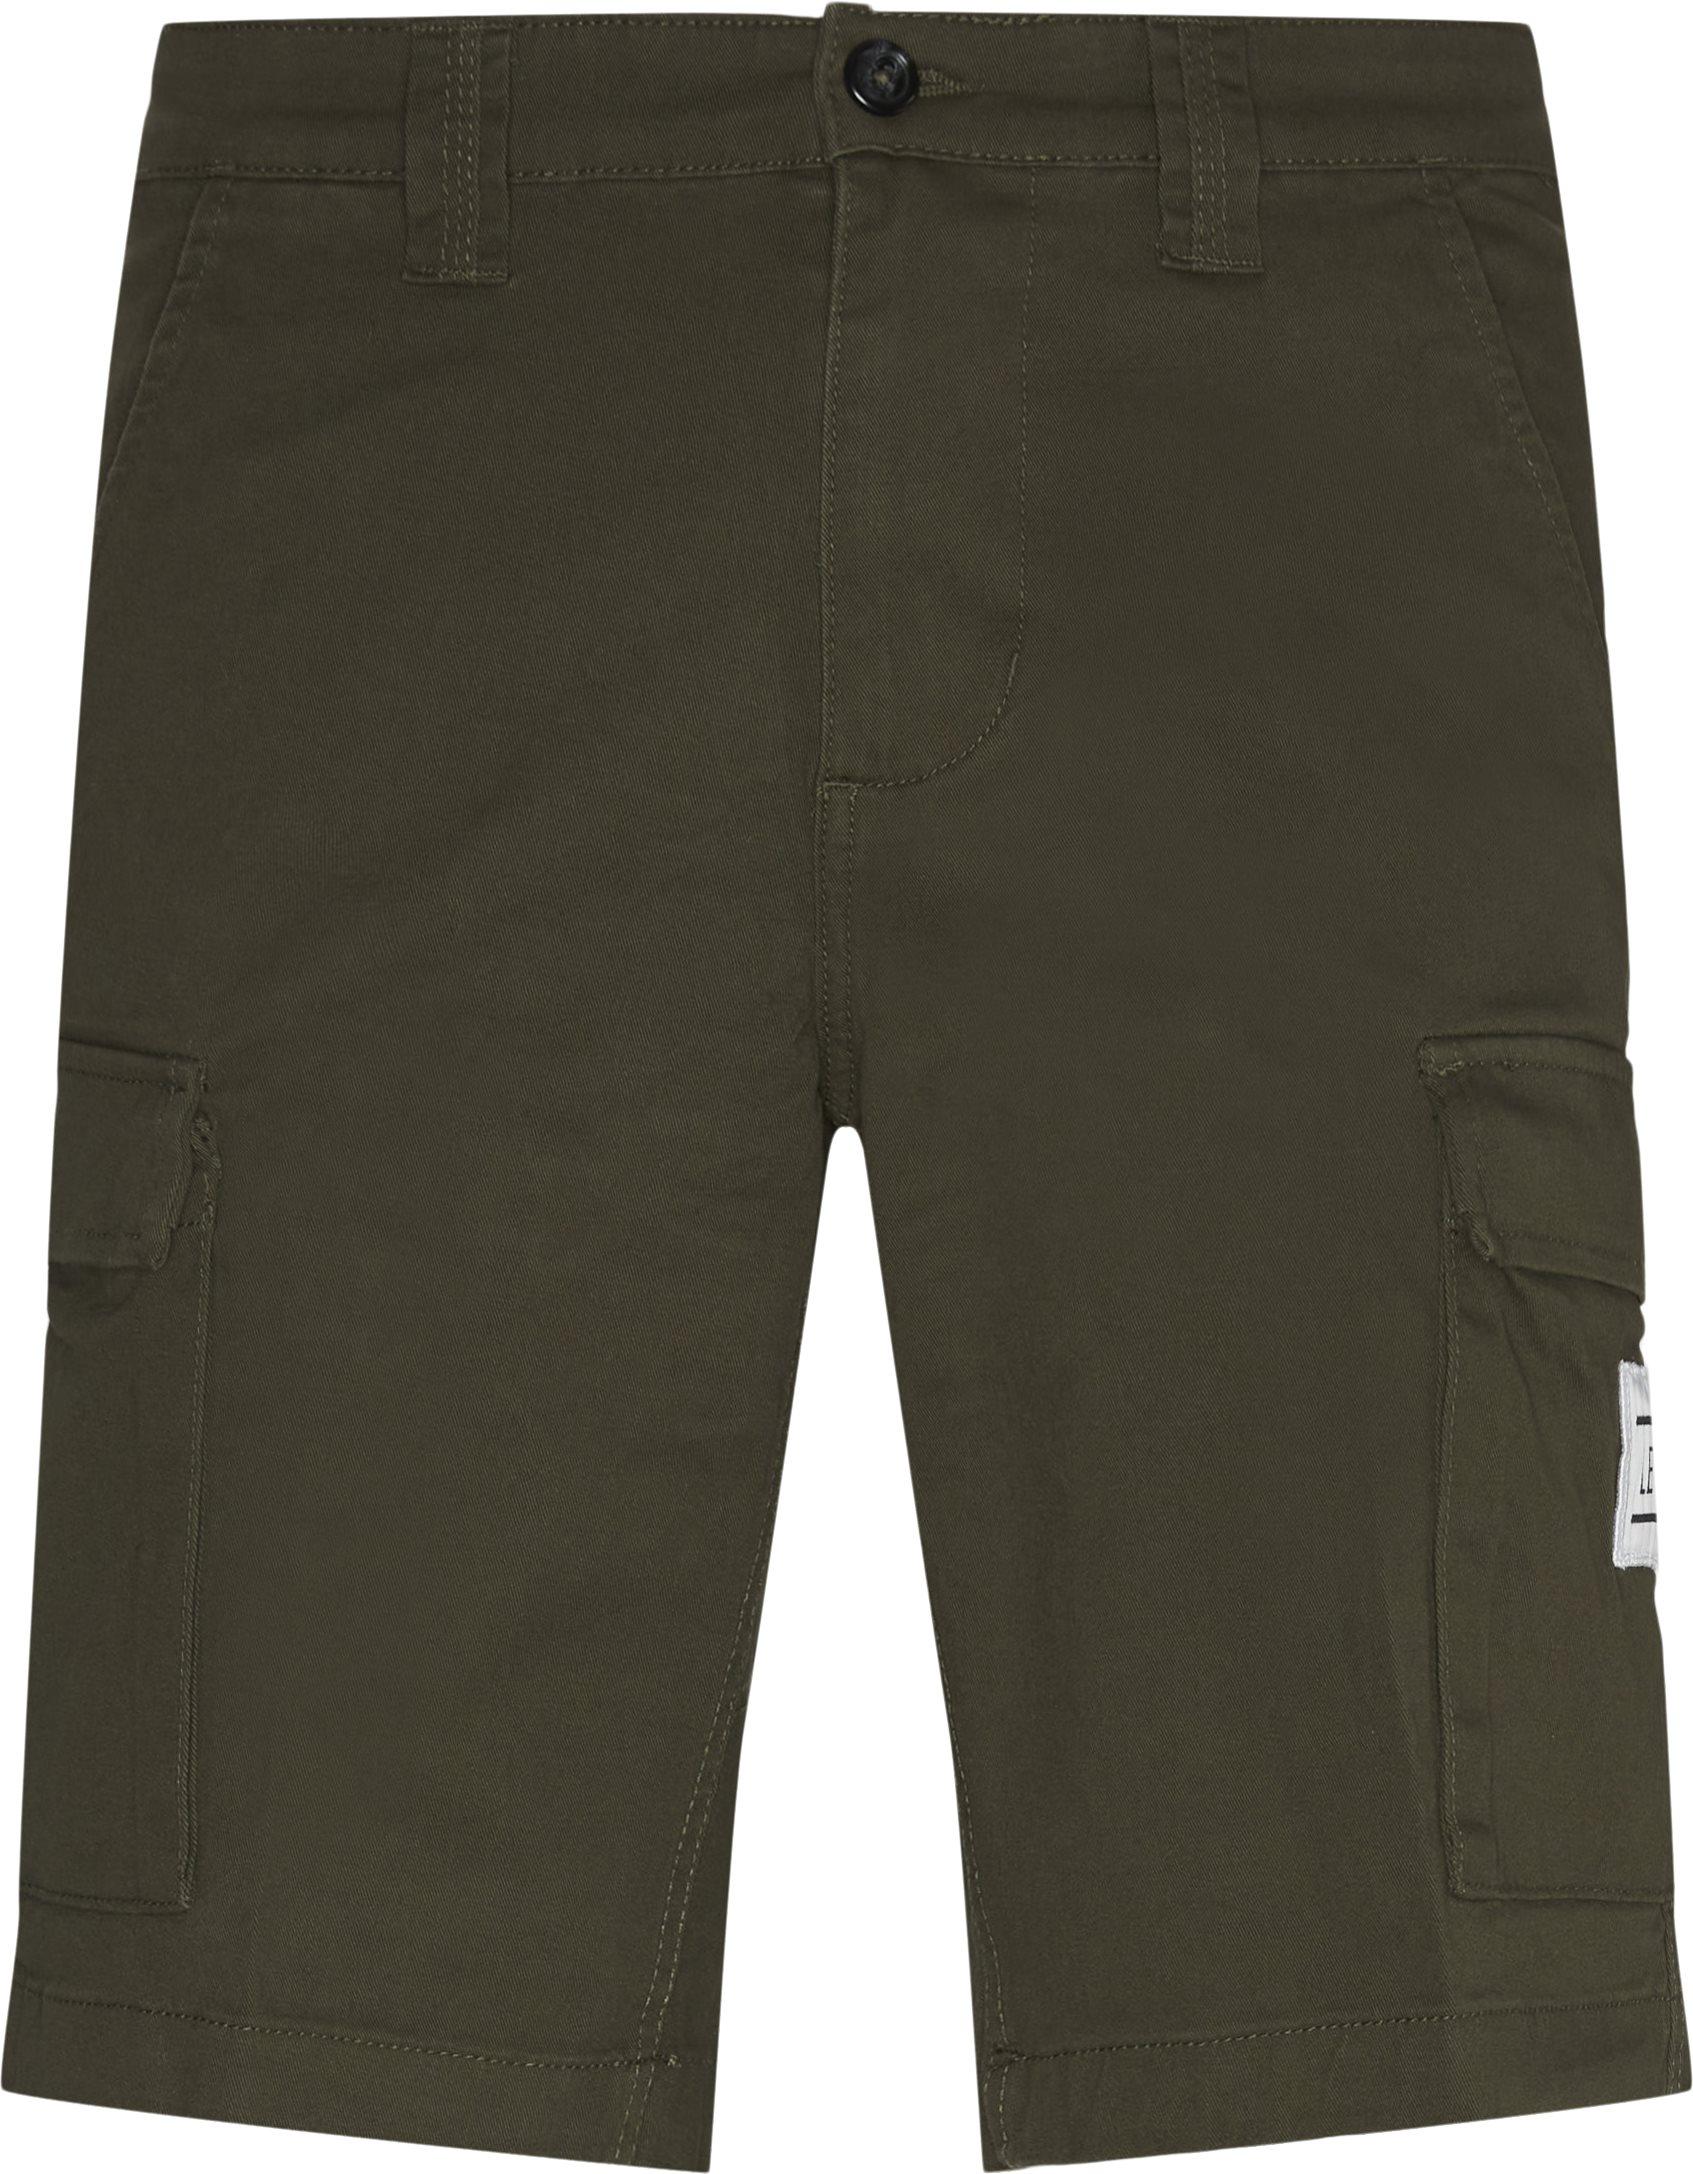 Cedric Shorts - Shorts - Loose - Army